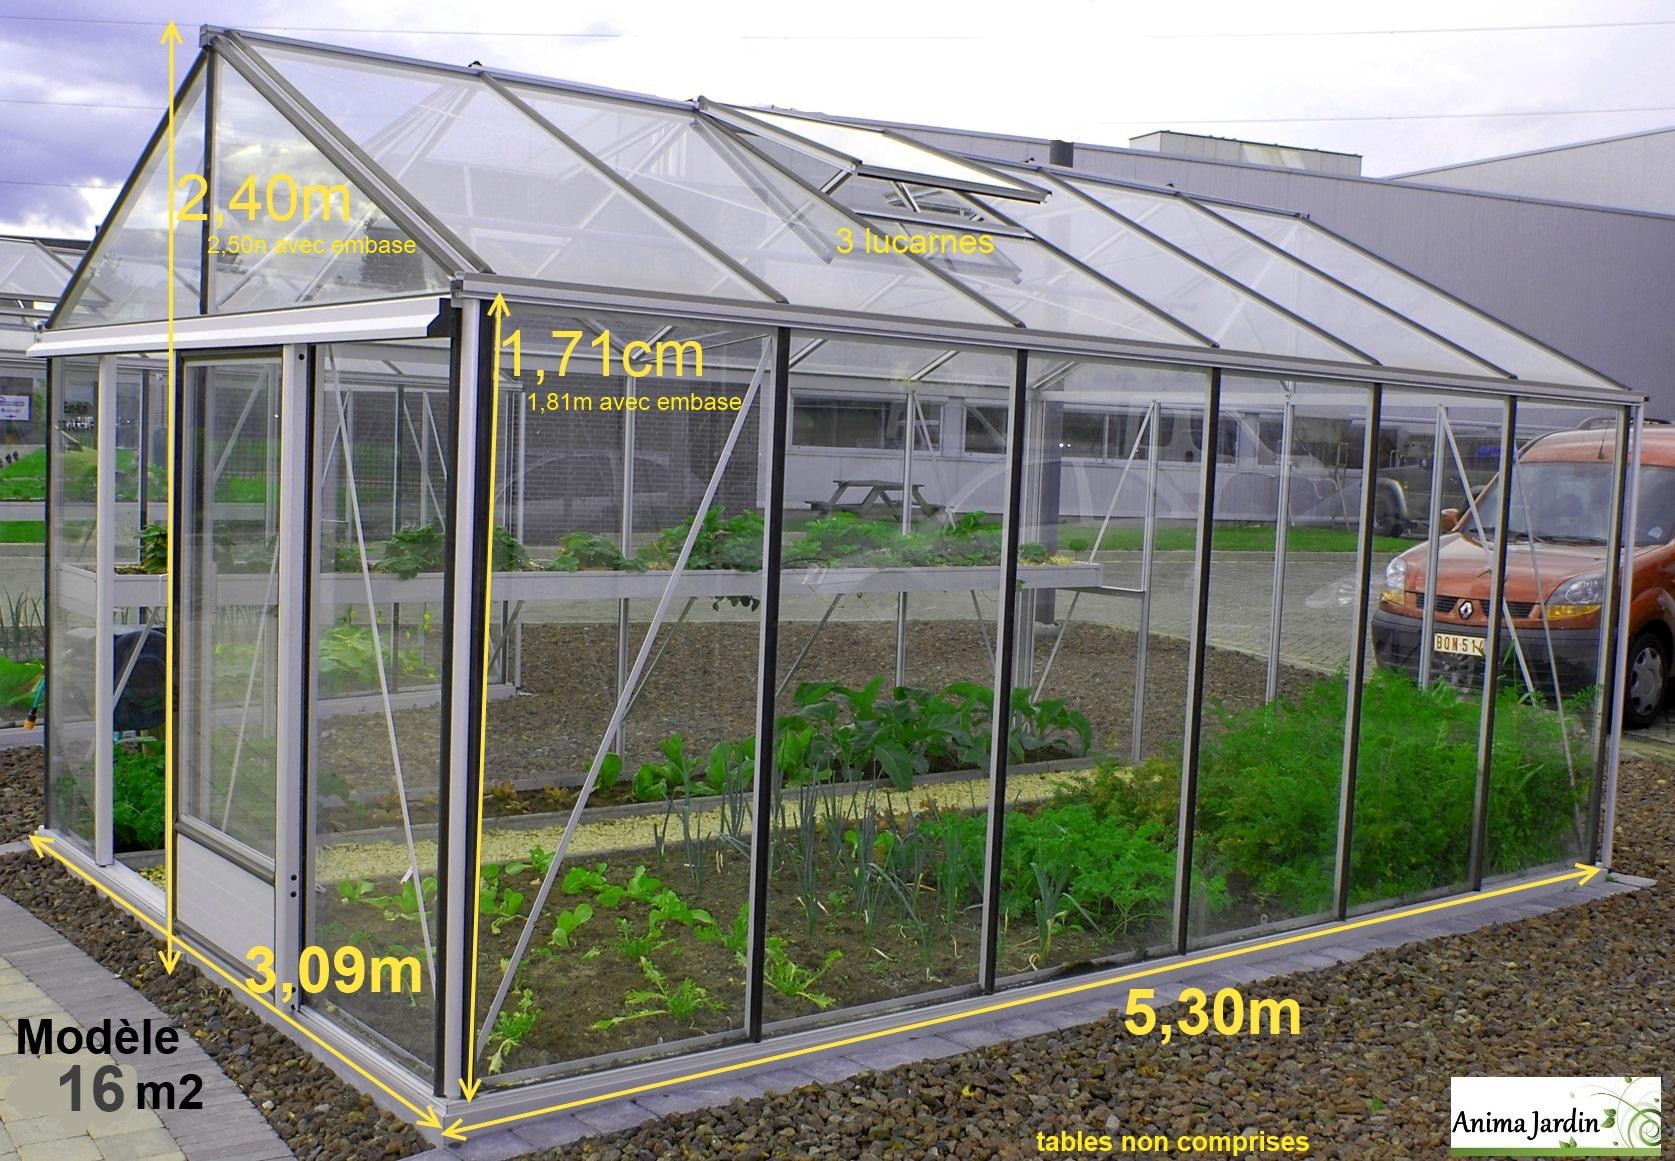 Serre Jardin Horticole, 16 M2, En Verre Trempé, Aluminium, Serre Euro Maxi,  Achat avec Solde Serre De Jardin